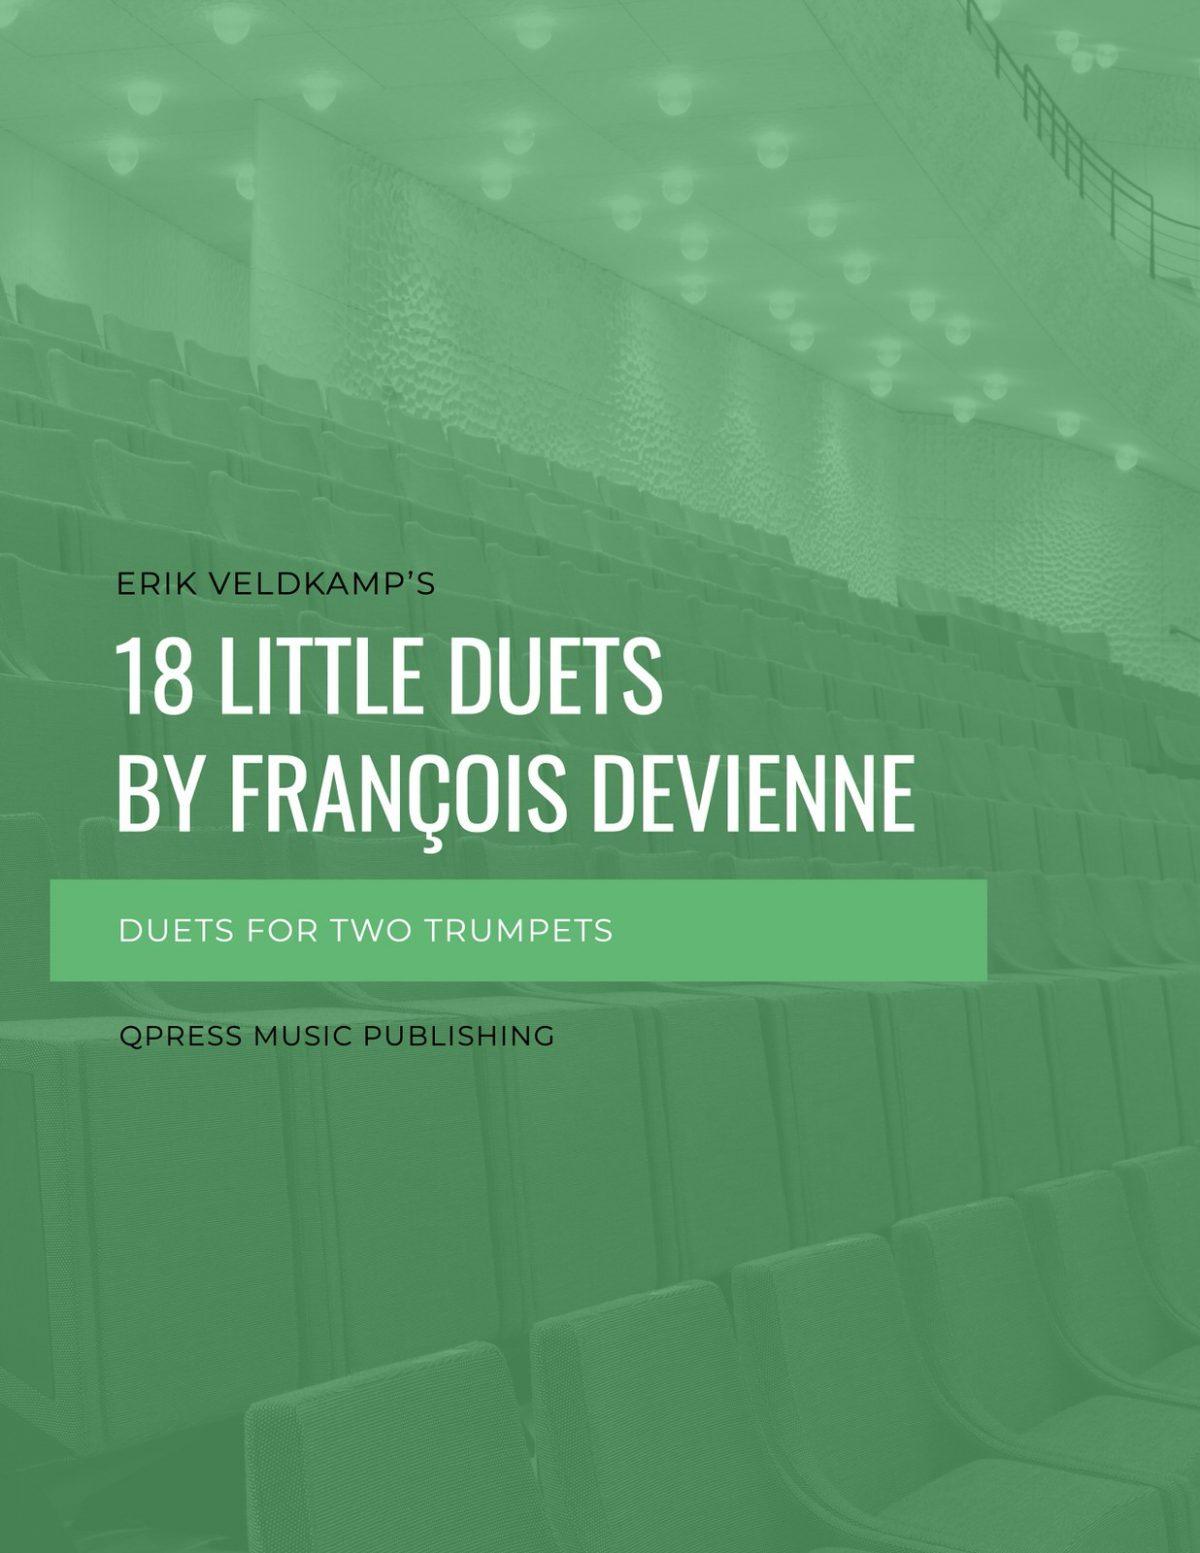 Veldkamp-Devienne, 18 Little Duets (for 2 trumpets)-p01